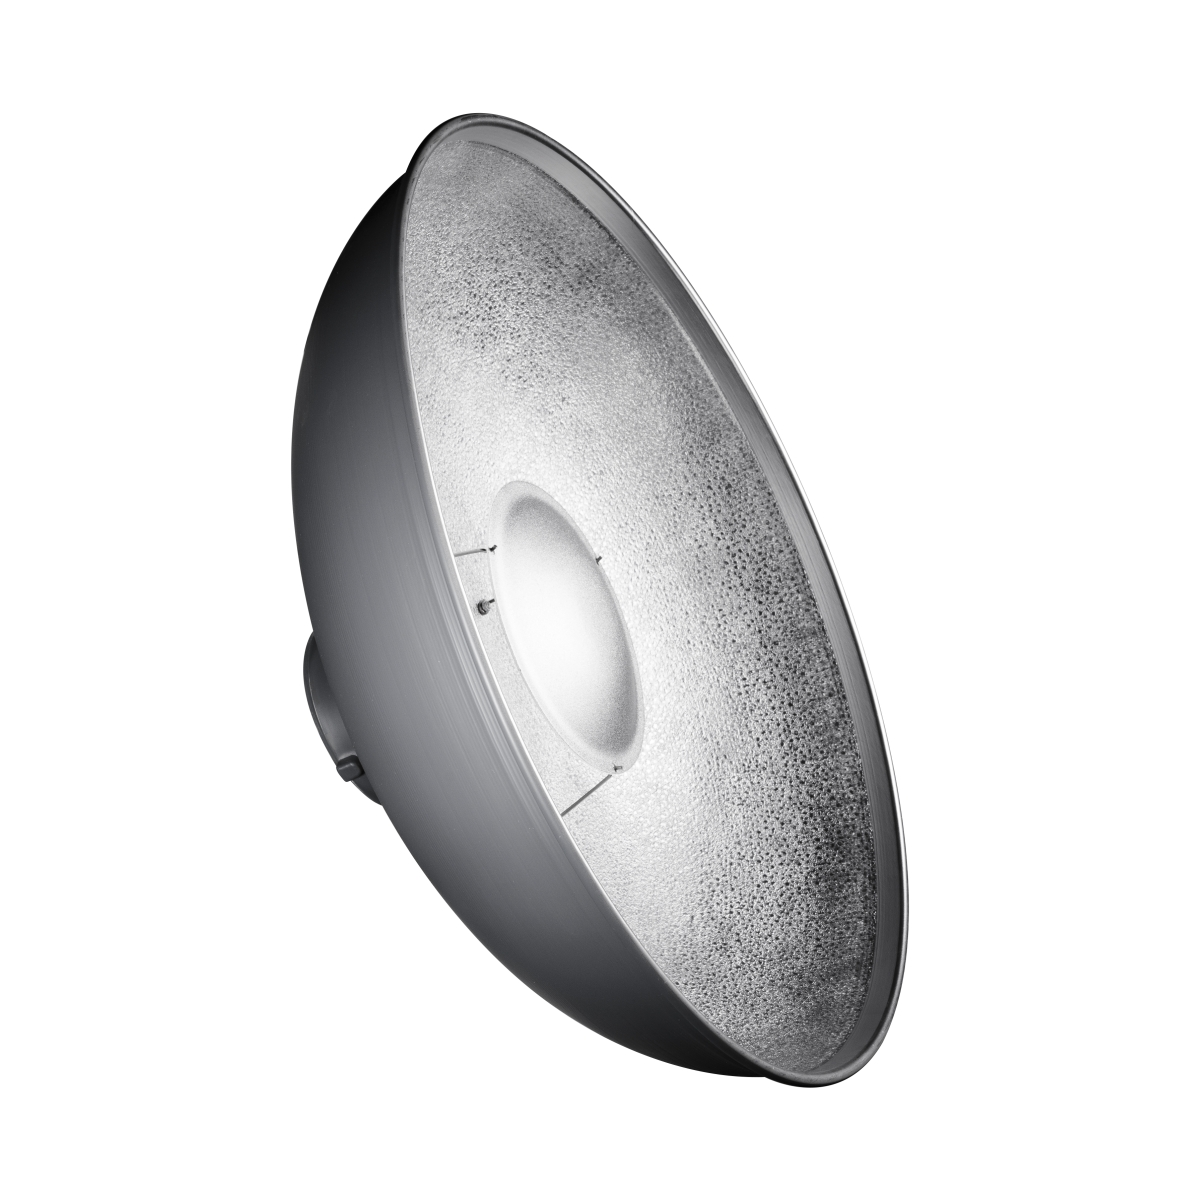 Walimex pro Beauty Dish 50cm for Walimex pro & K